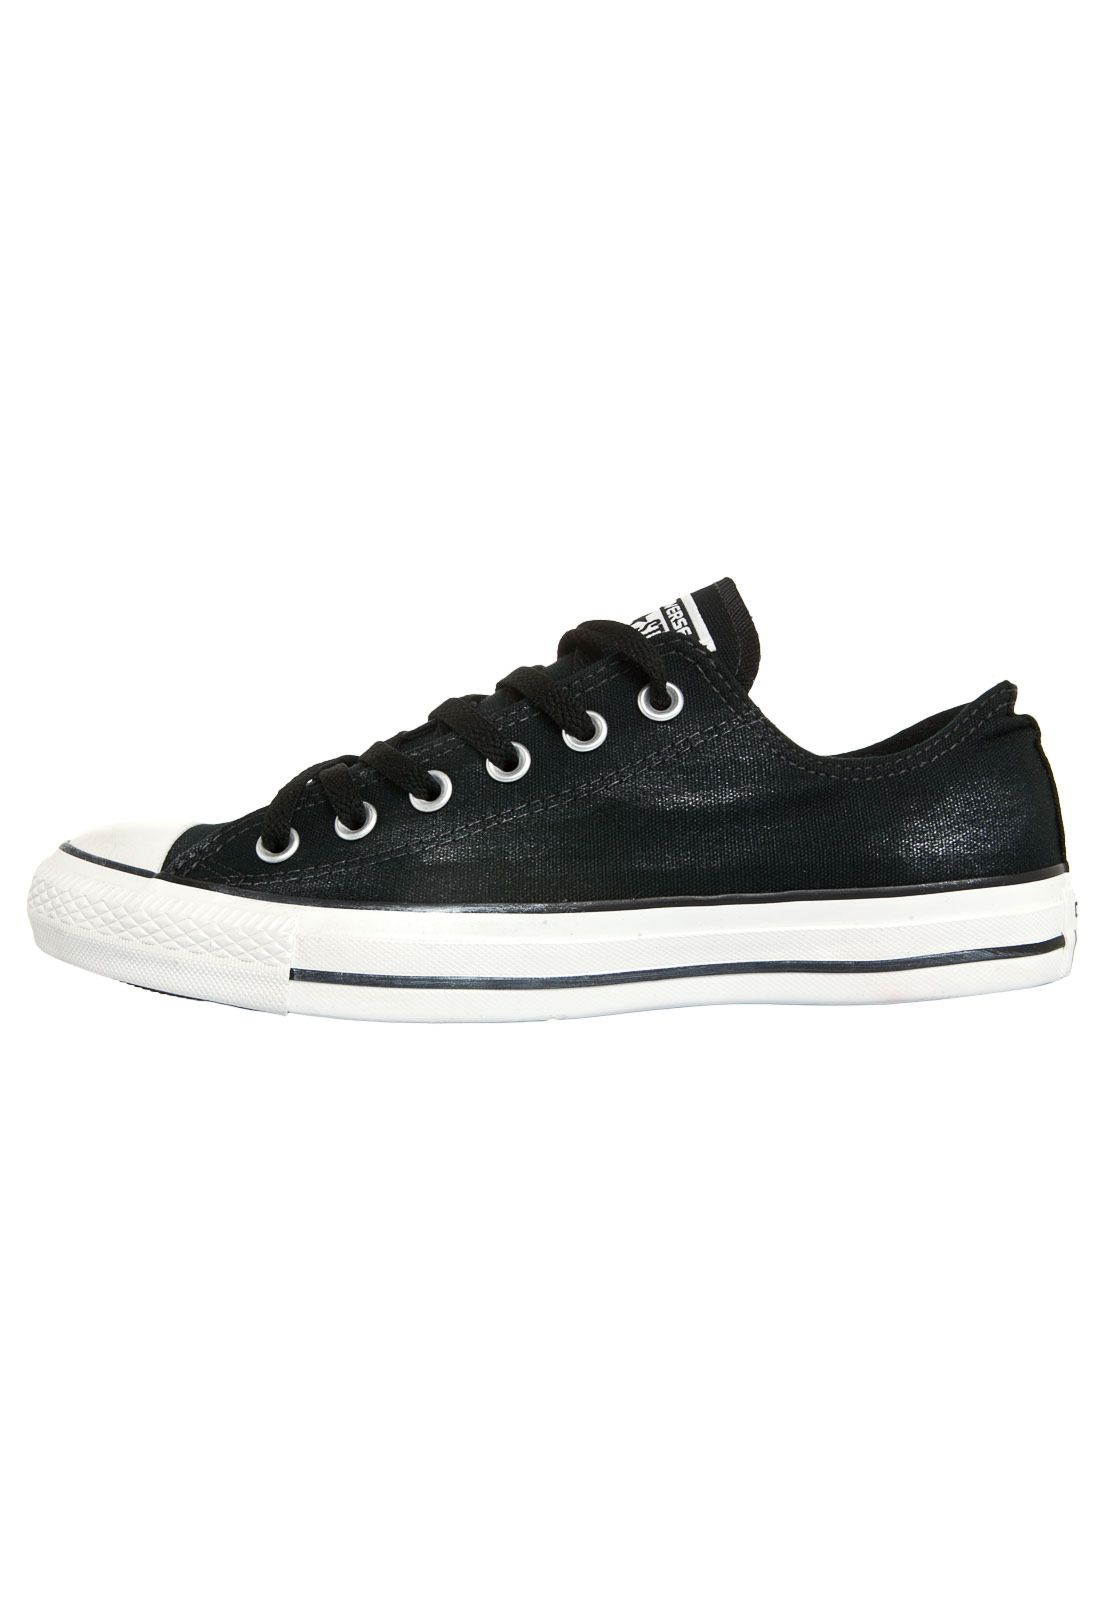 Tênis Converse All Star Ct As Ox Preto - Compre Agora  1f32b0e074262